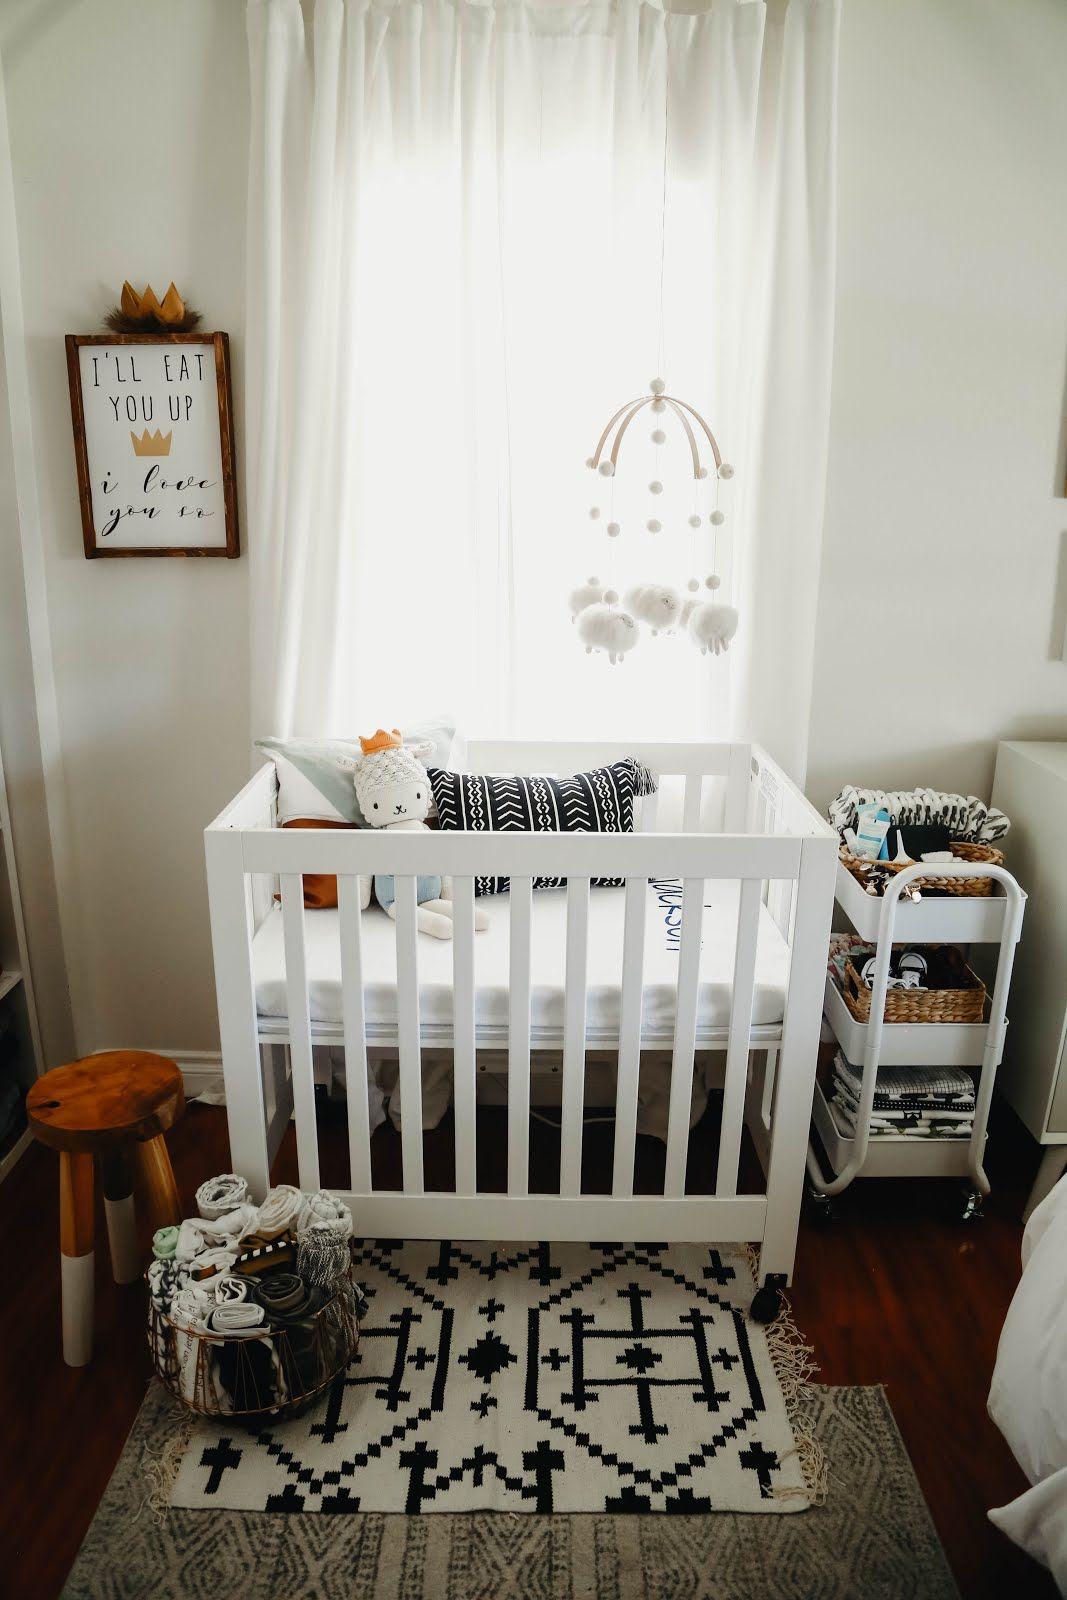 shared bedroom nursery reveal Shared bedroom, Mansion